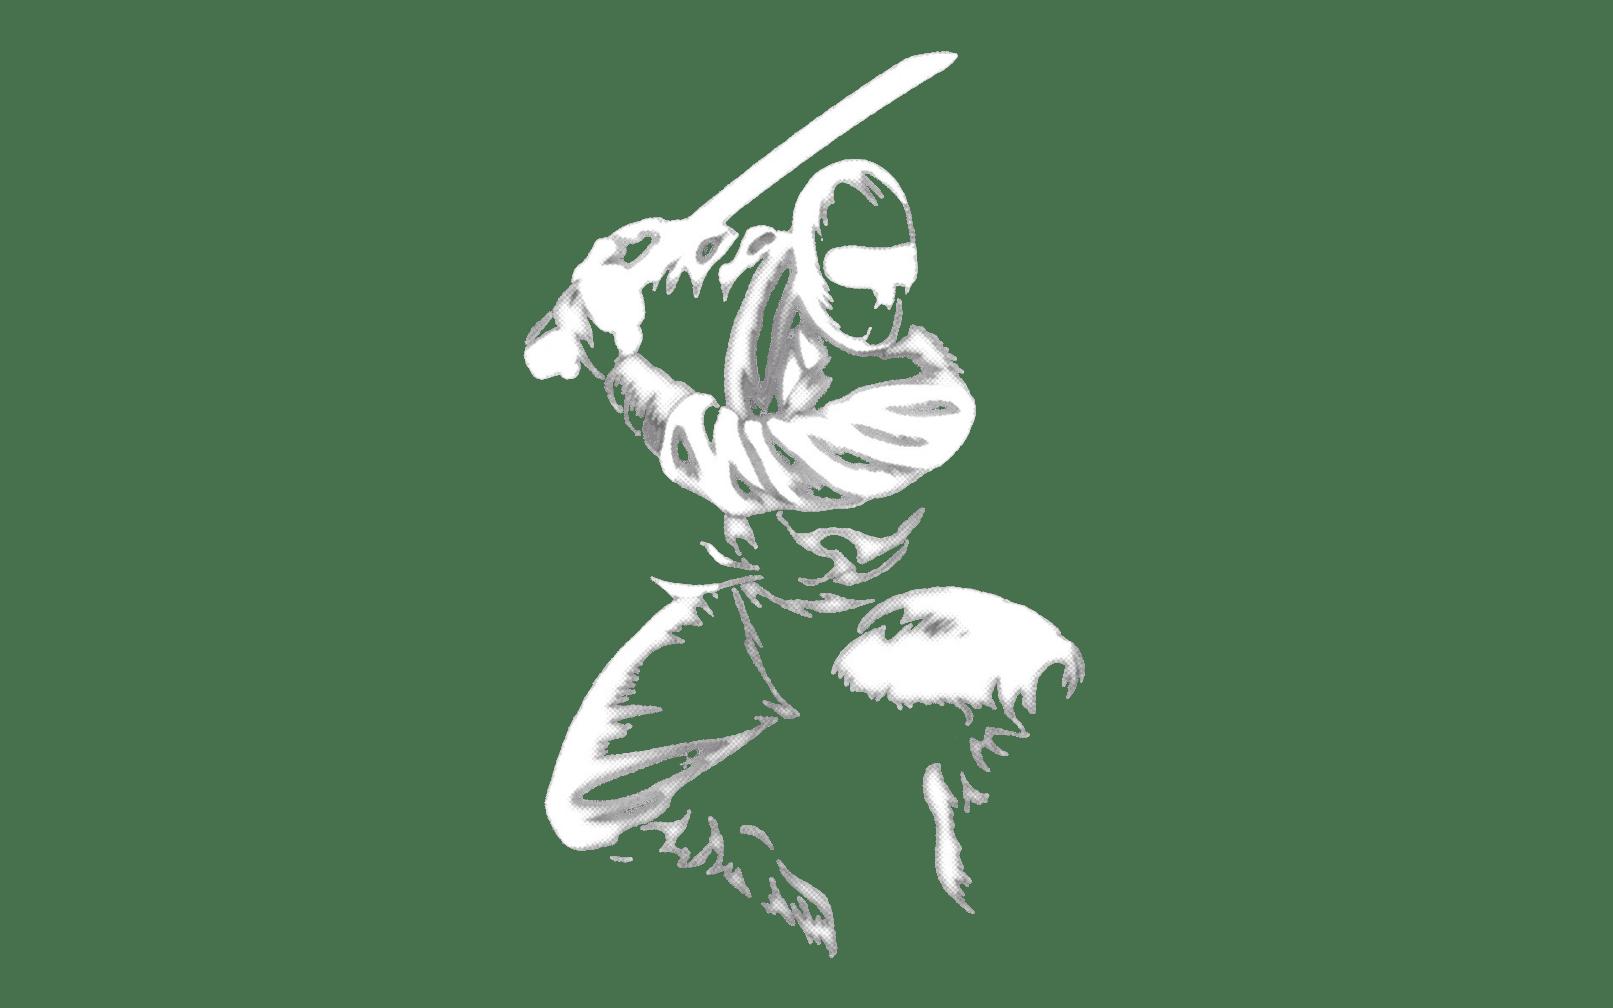 Jumping Ninja with a Sword